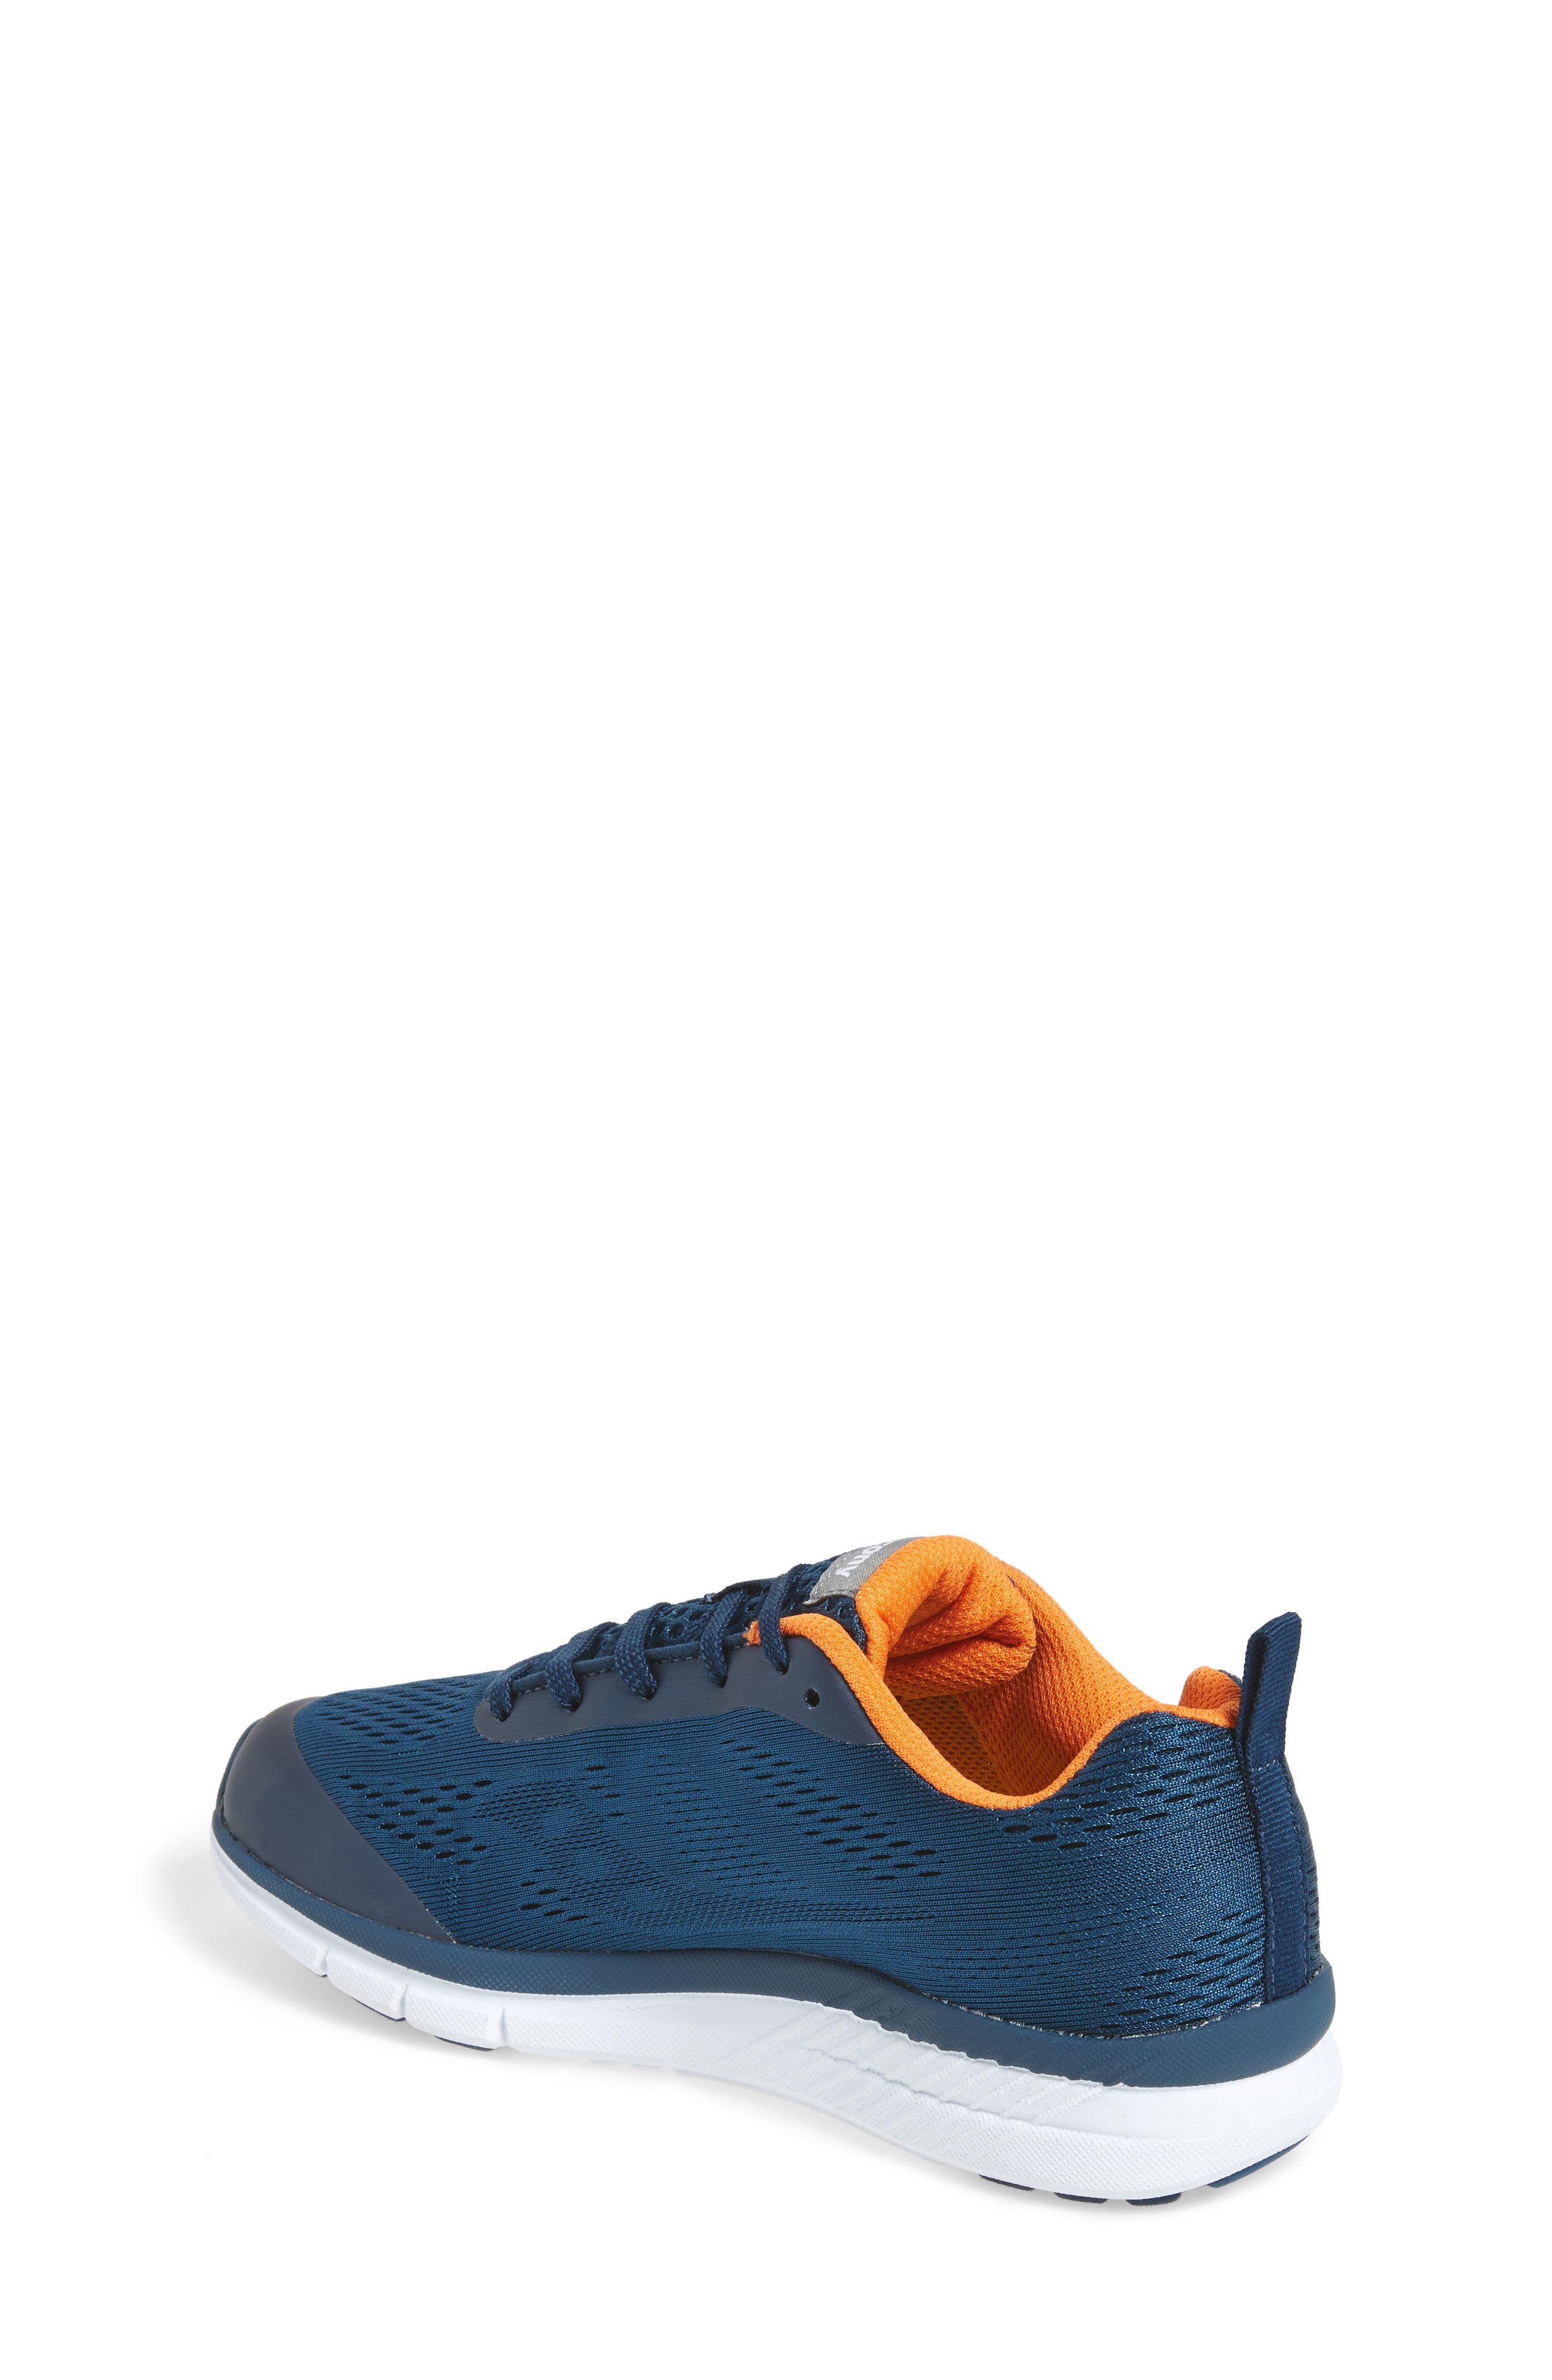 Alternate Image 2  - Saucony Ideal Sneaker (Toddler, Little Kid & Big Kid)